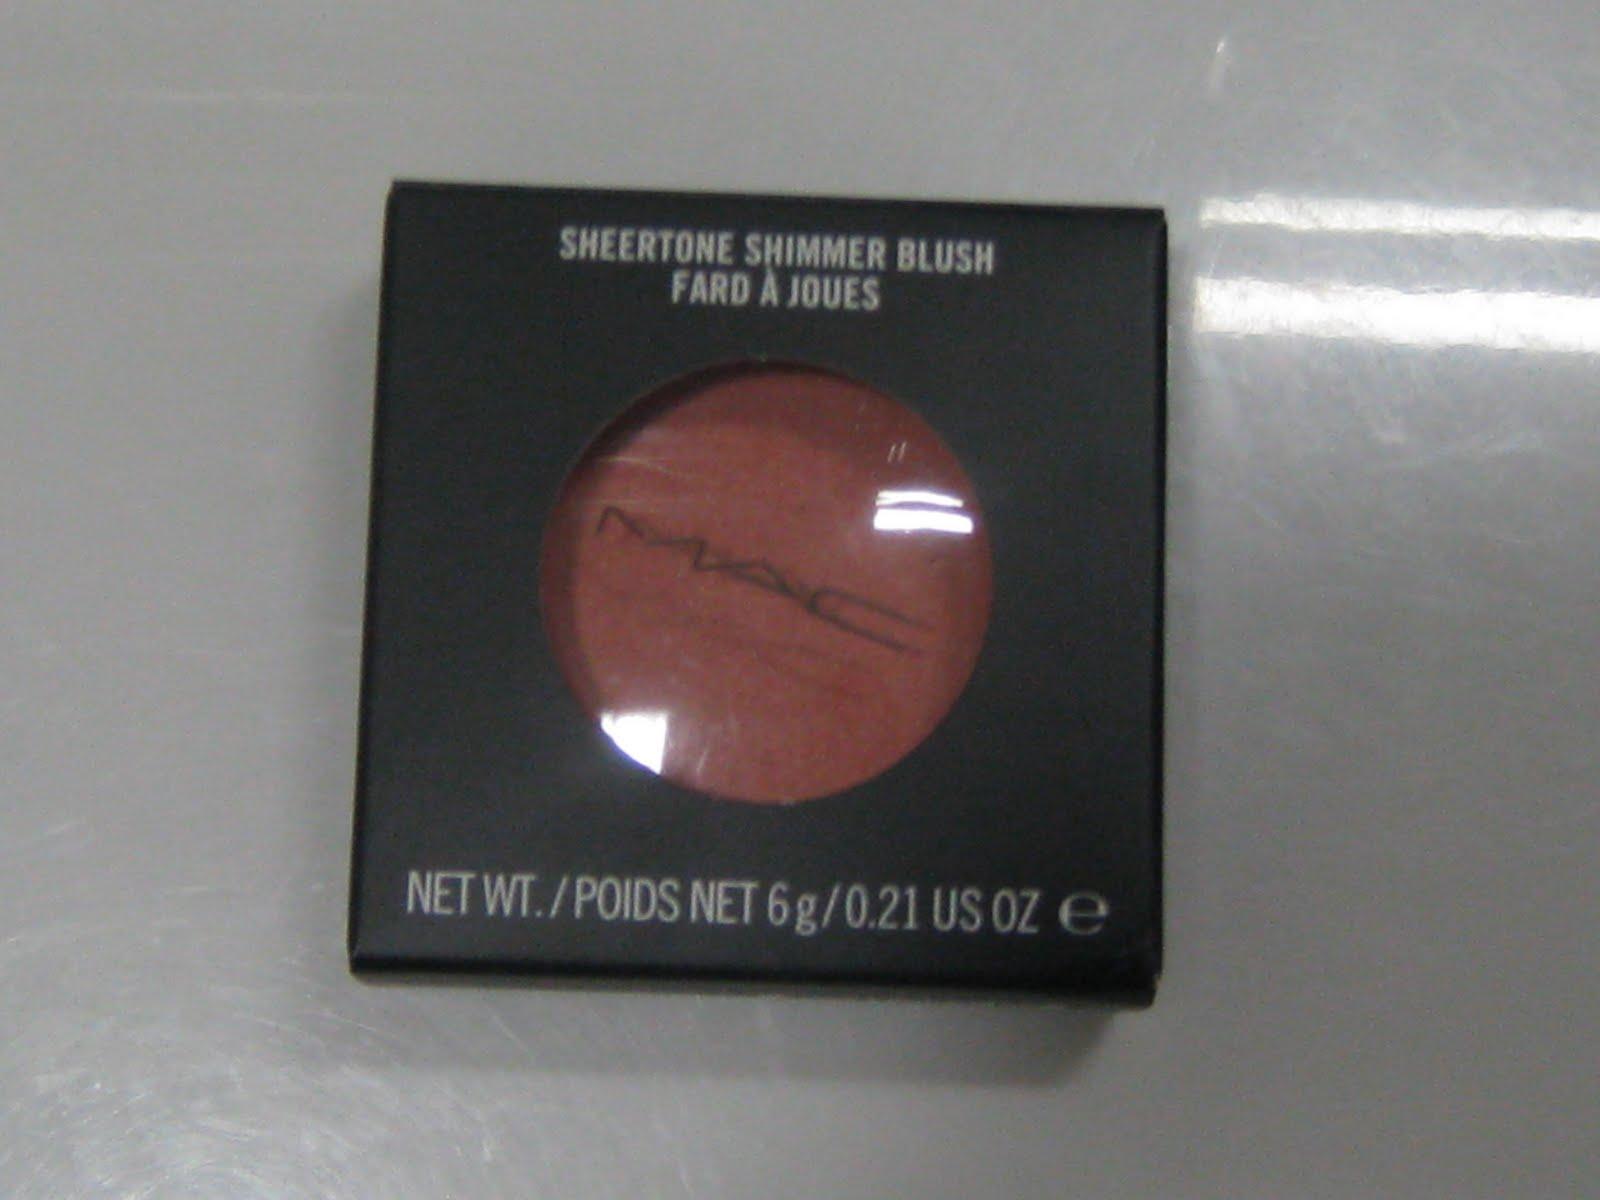 Beauty Blog: Mac Sheertone Shimmer Blush